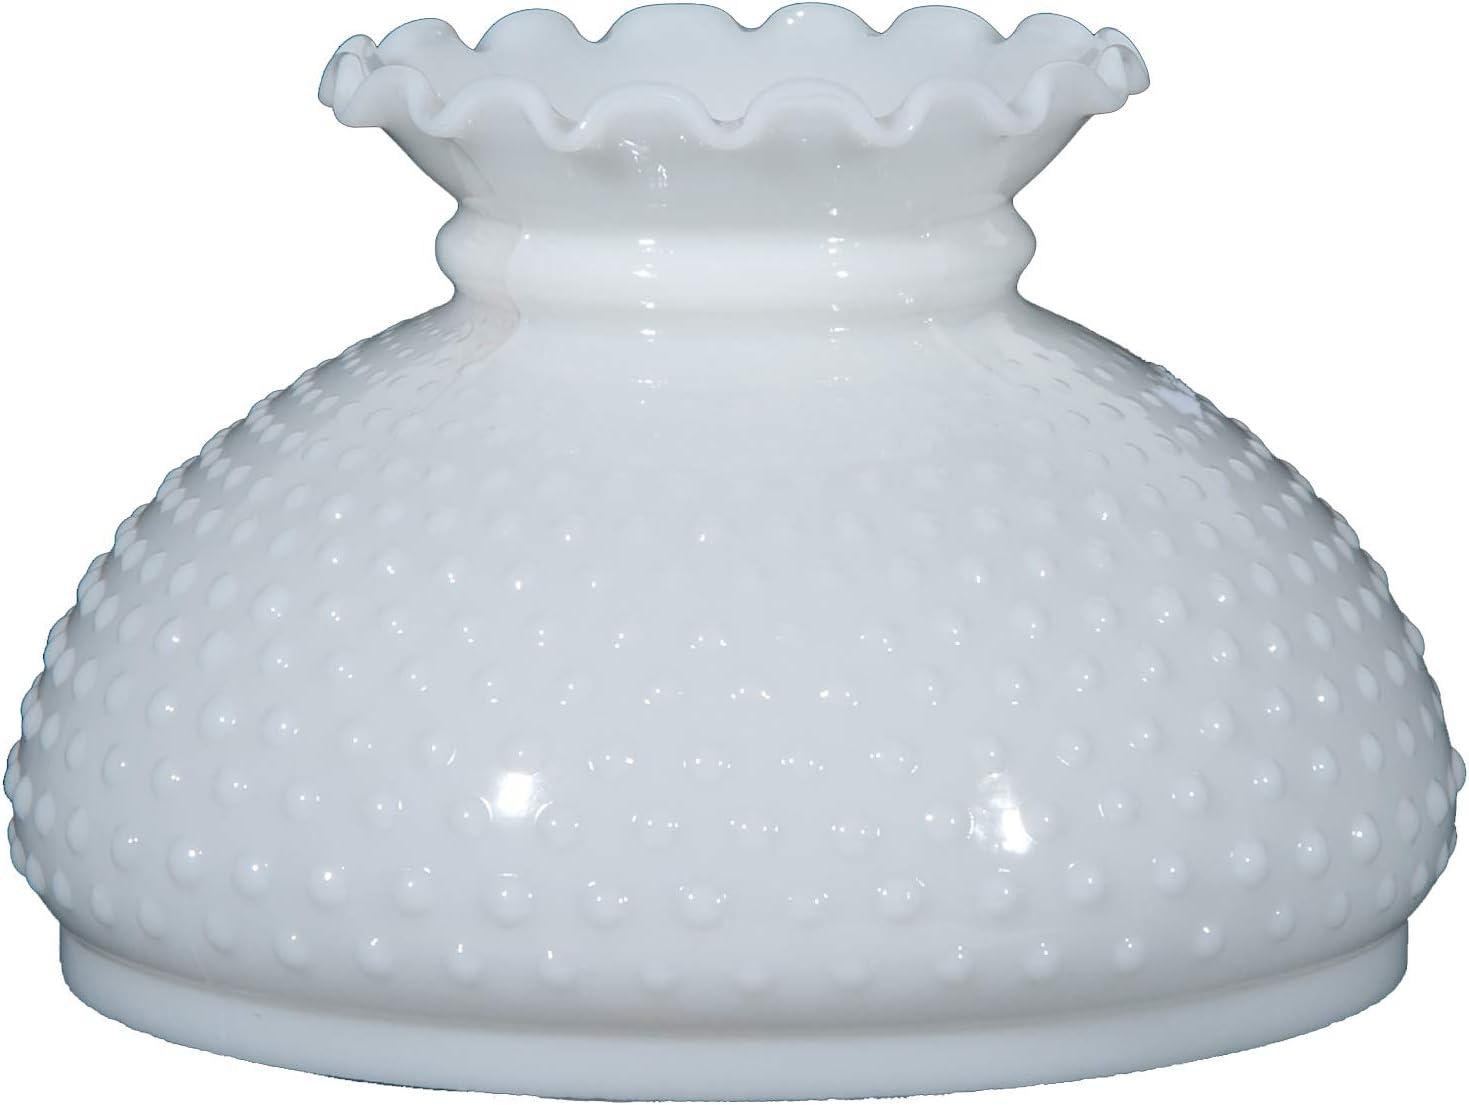 B P Lamp 10 Shade, STU, Opal, Hobnail